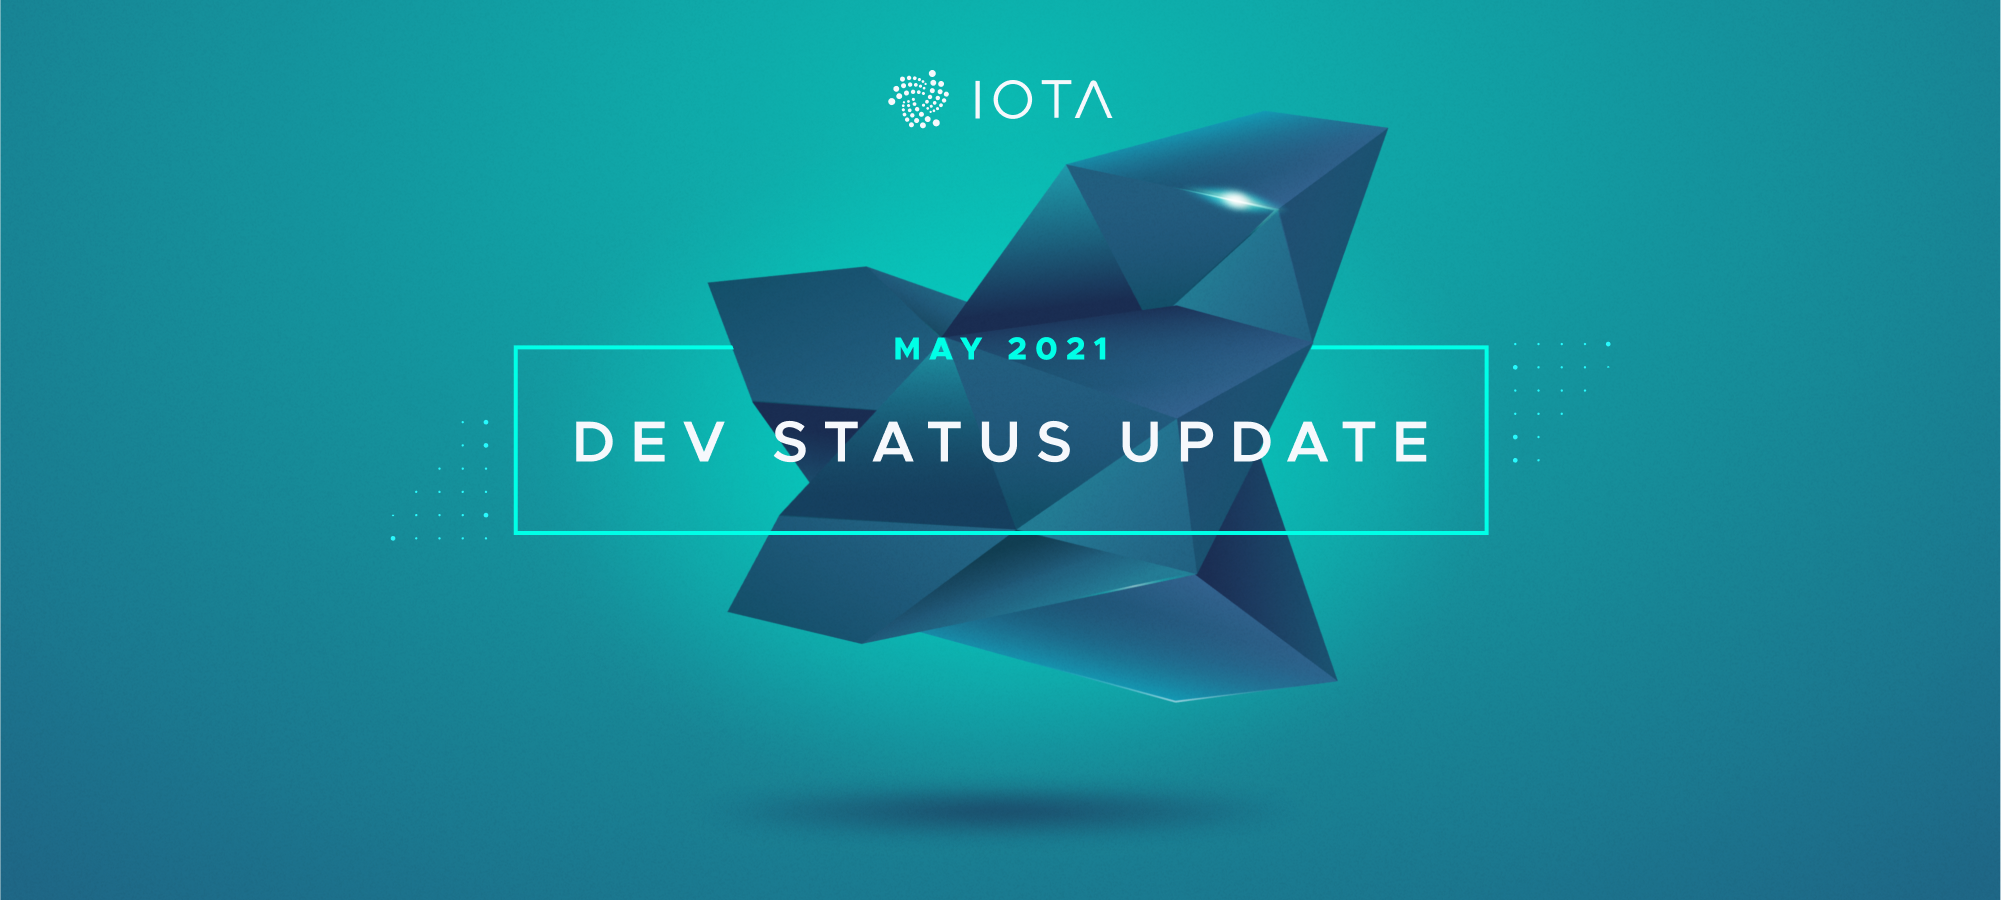 Dev Status Update - May, 2021